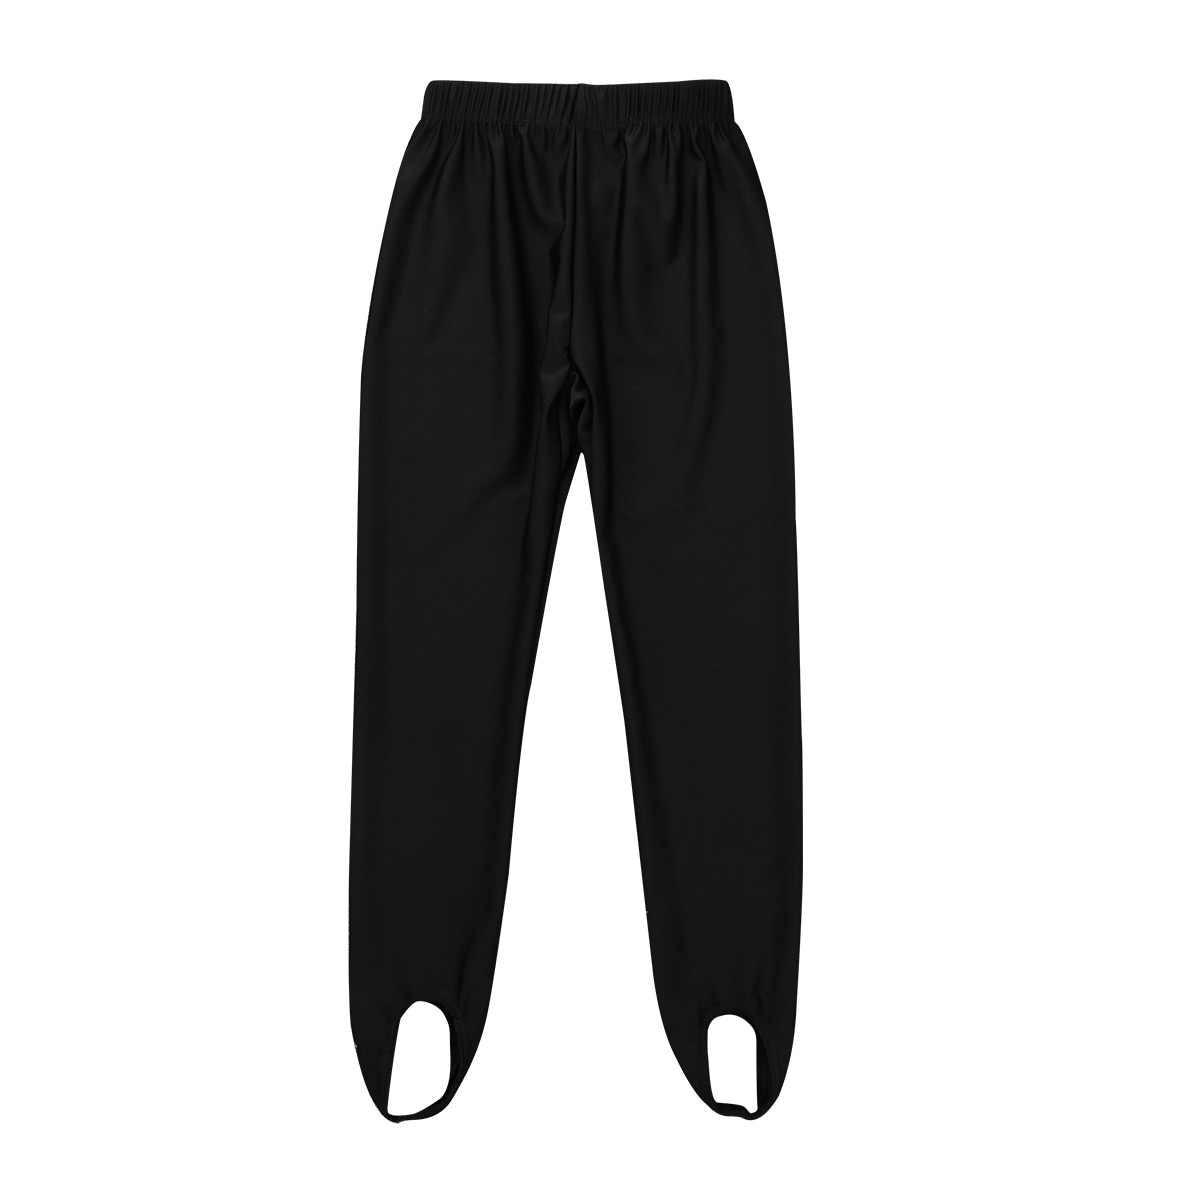 3f45d6253cee9 ... TiaoBug Kids Teens Dance Pantyhose Stockings Stirrup Legging Tight  Children Unisex Boys Girls Yoga Gymnastics Ballet ...